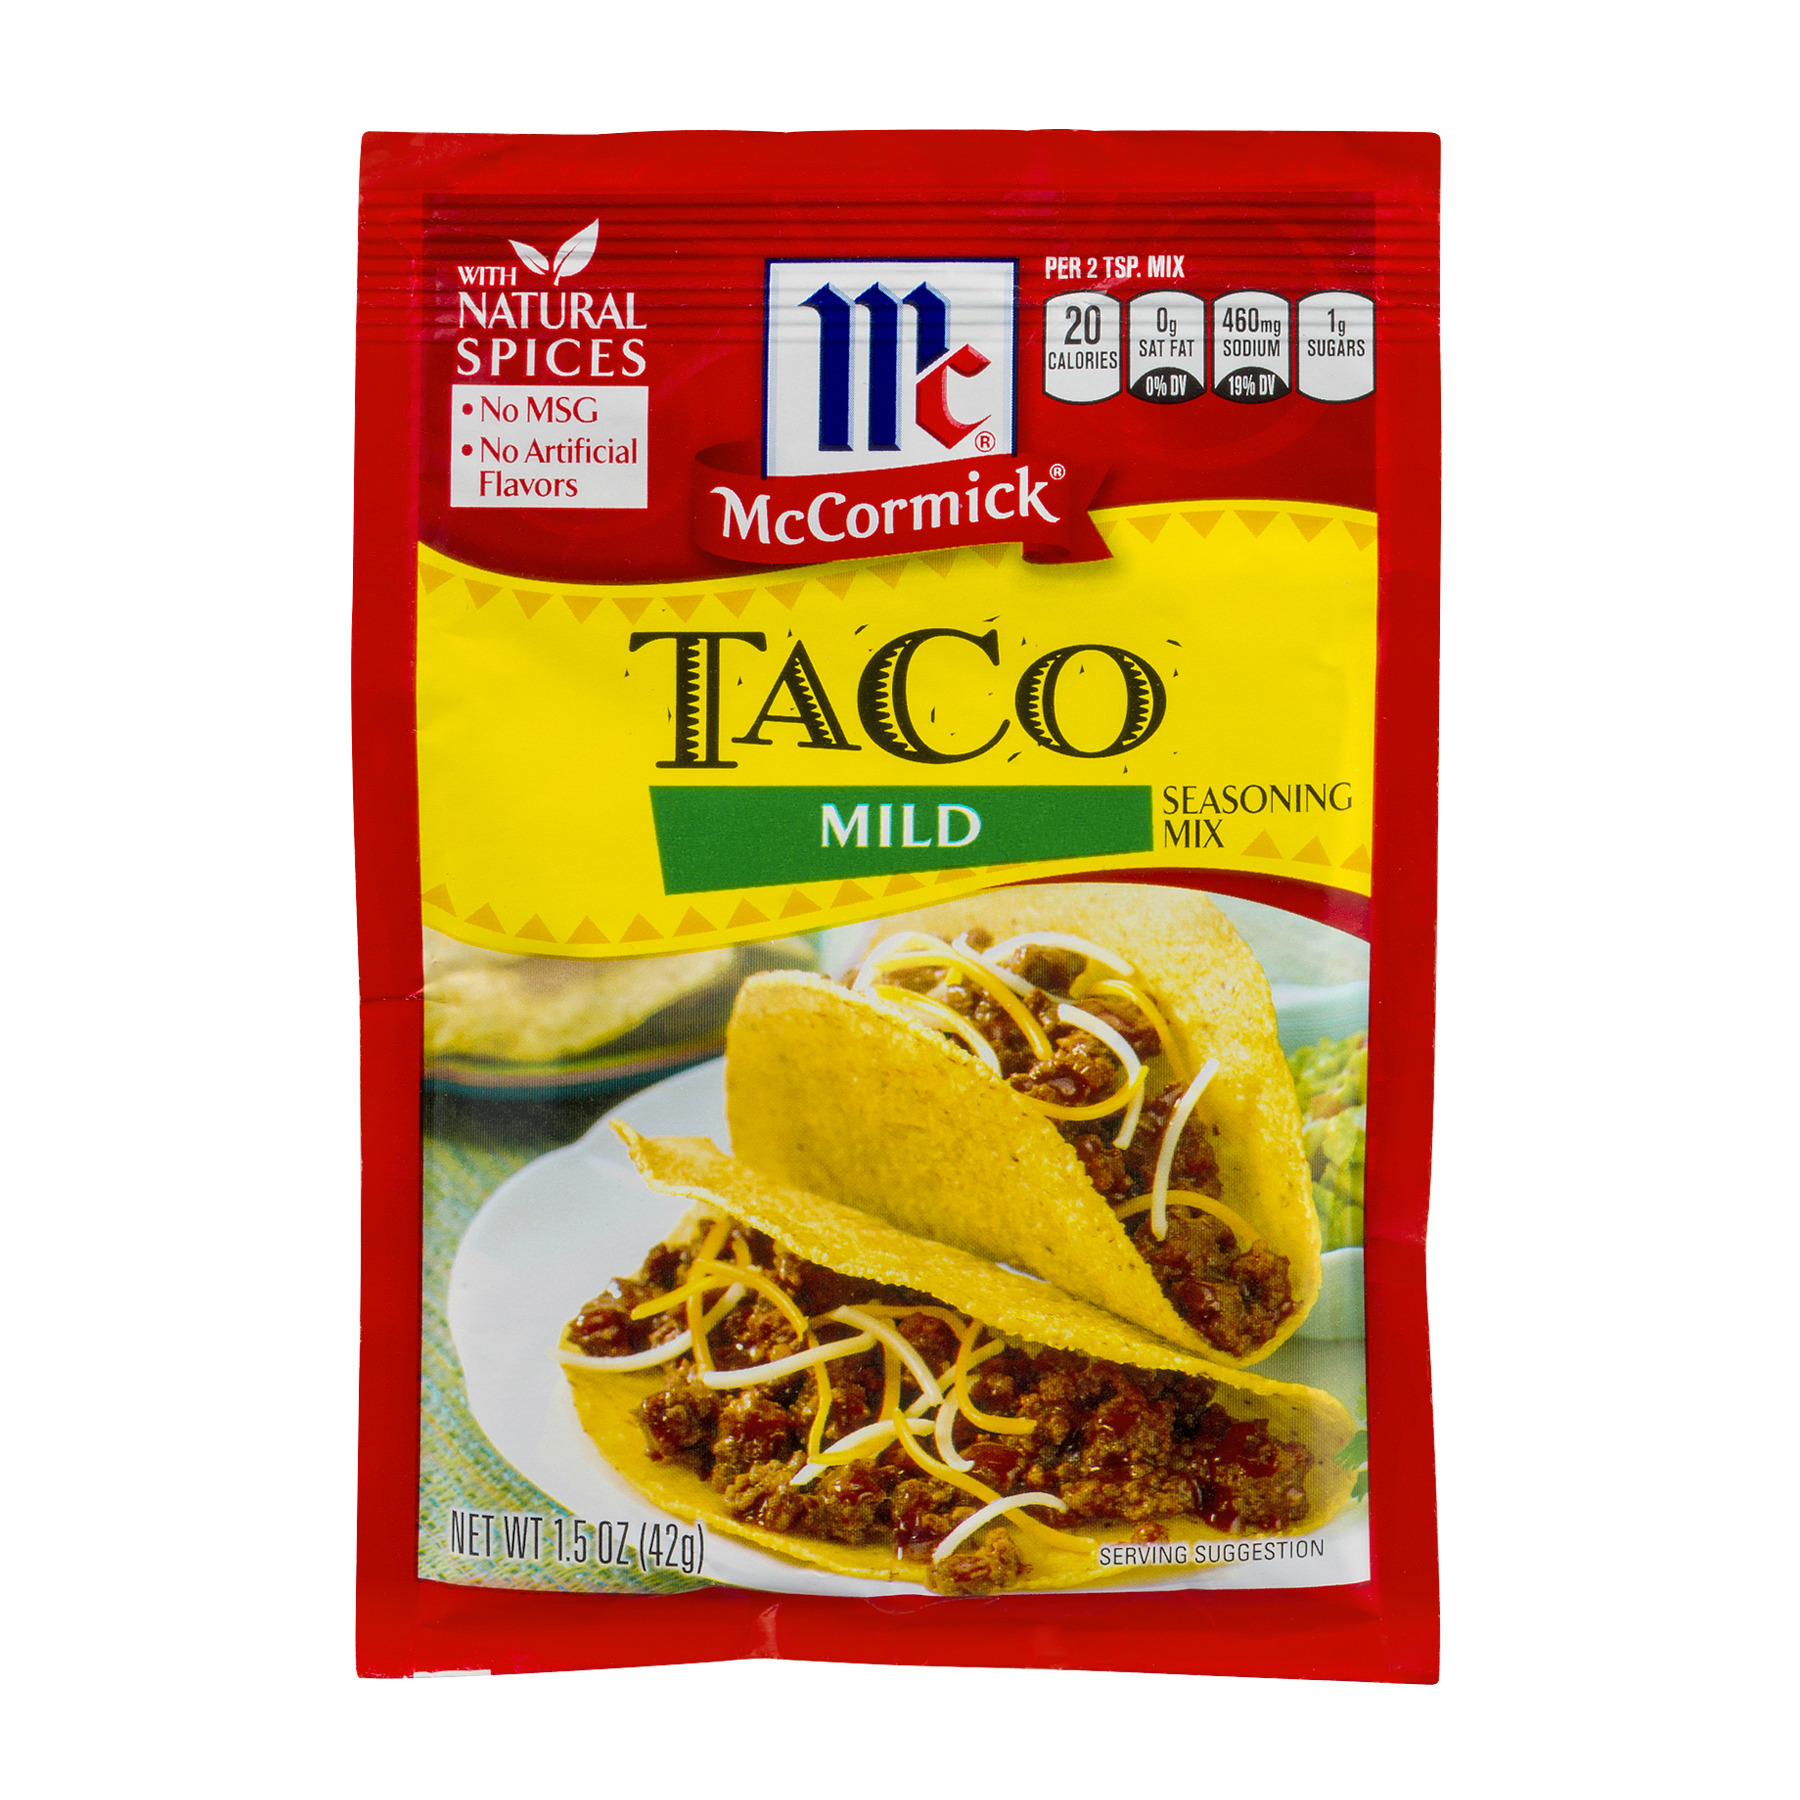 McCormick Taco Mild Seasoning Mix, 1.5 OZ